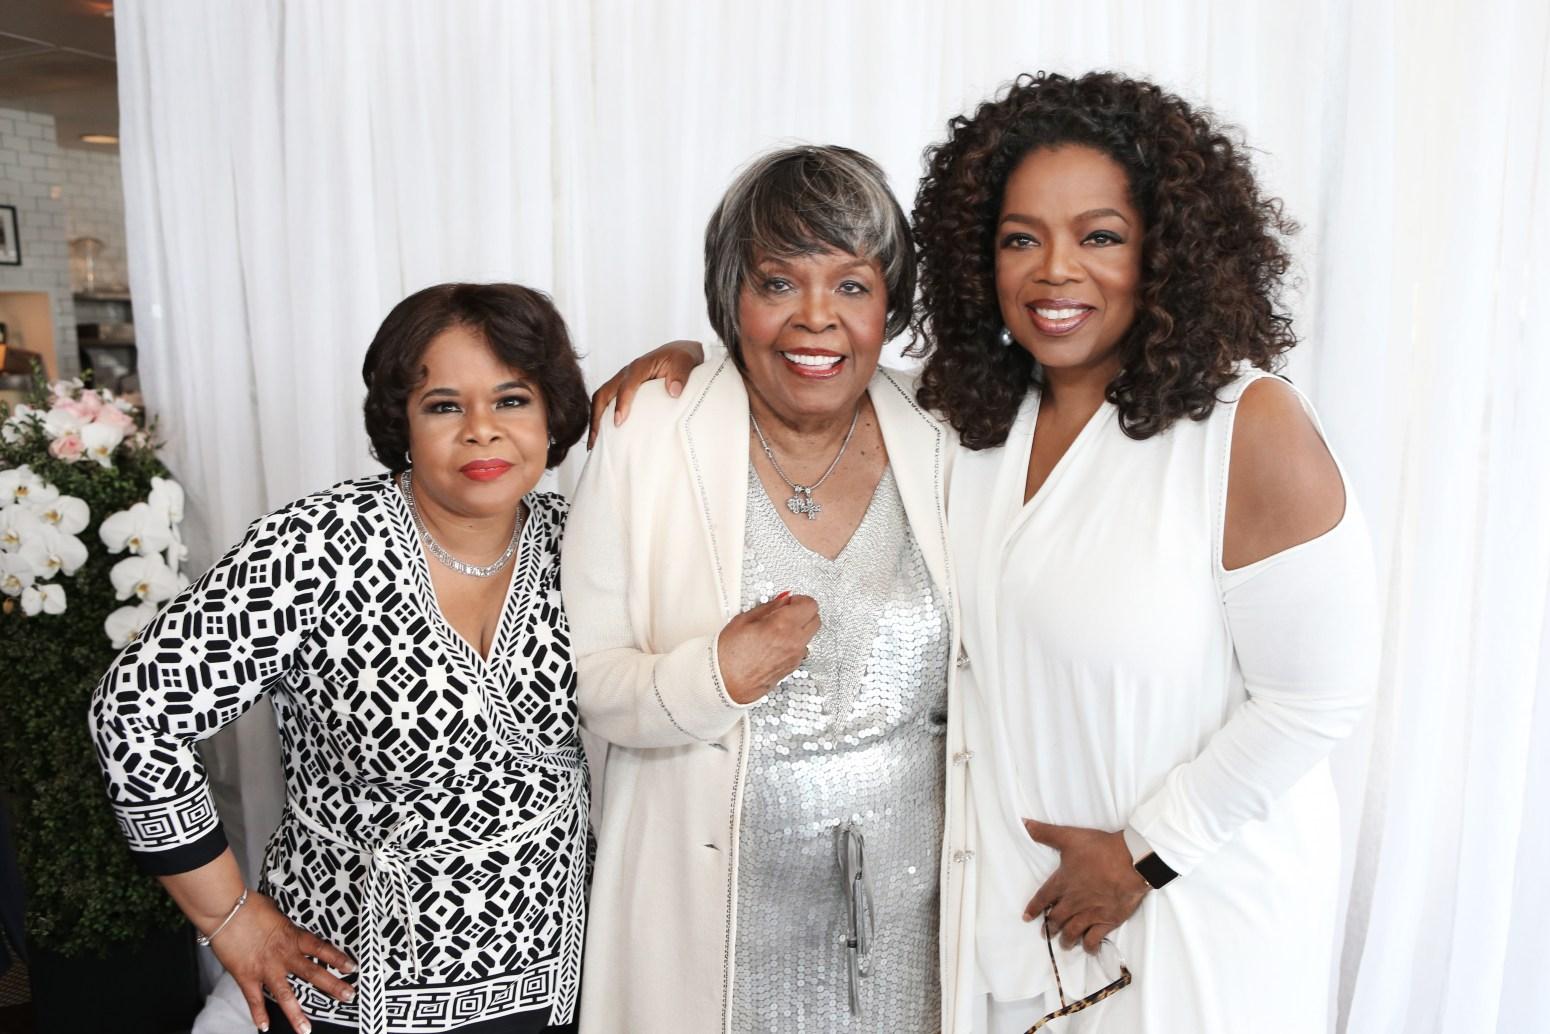 African American Communities, Oprah, Oprah Winfrey, Vernita Lee, KOLUMN Magazine, KOLUMN, African American News, Willoughby Avenue